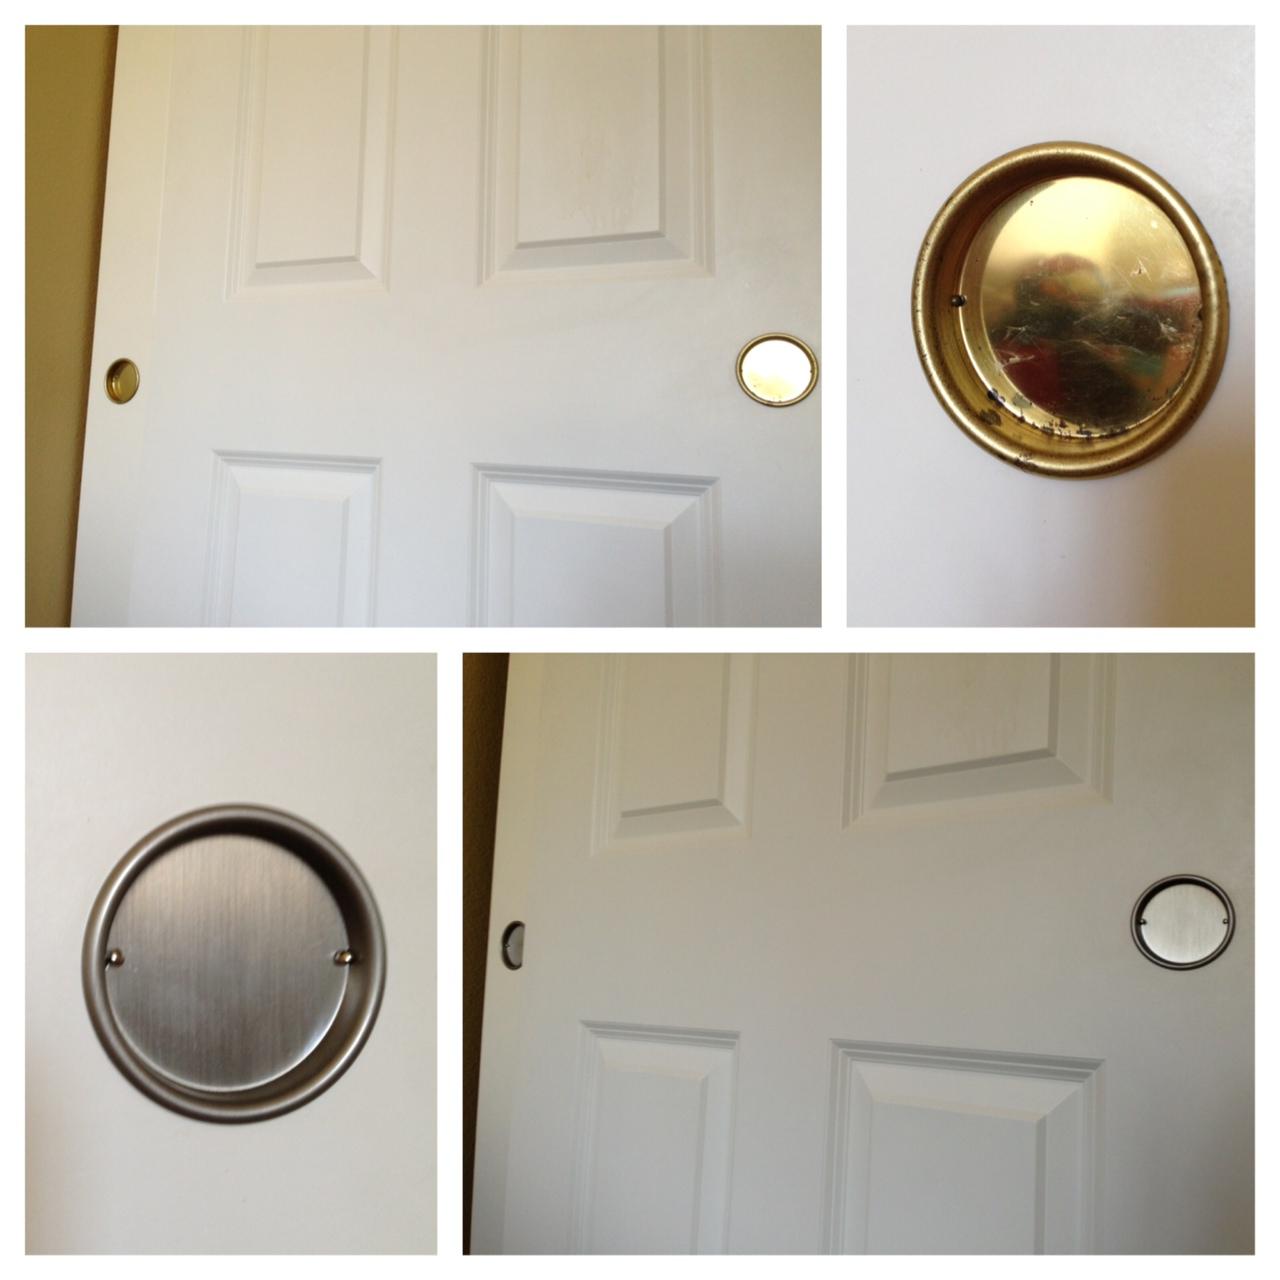 in knots easy upgrade closet door hardware. Black Bedroom Furniture Sets. Home Design Ideas